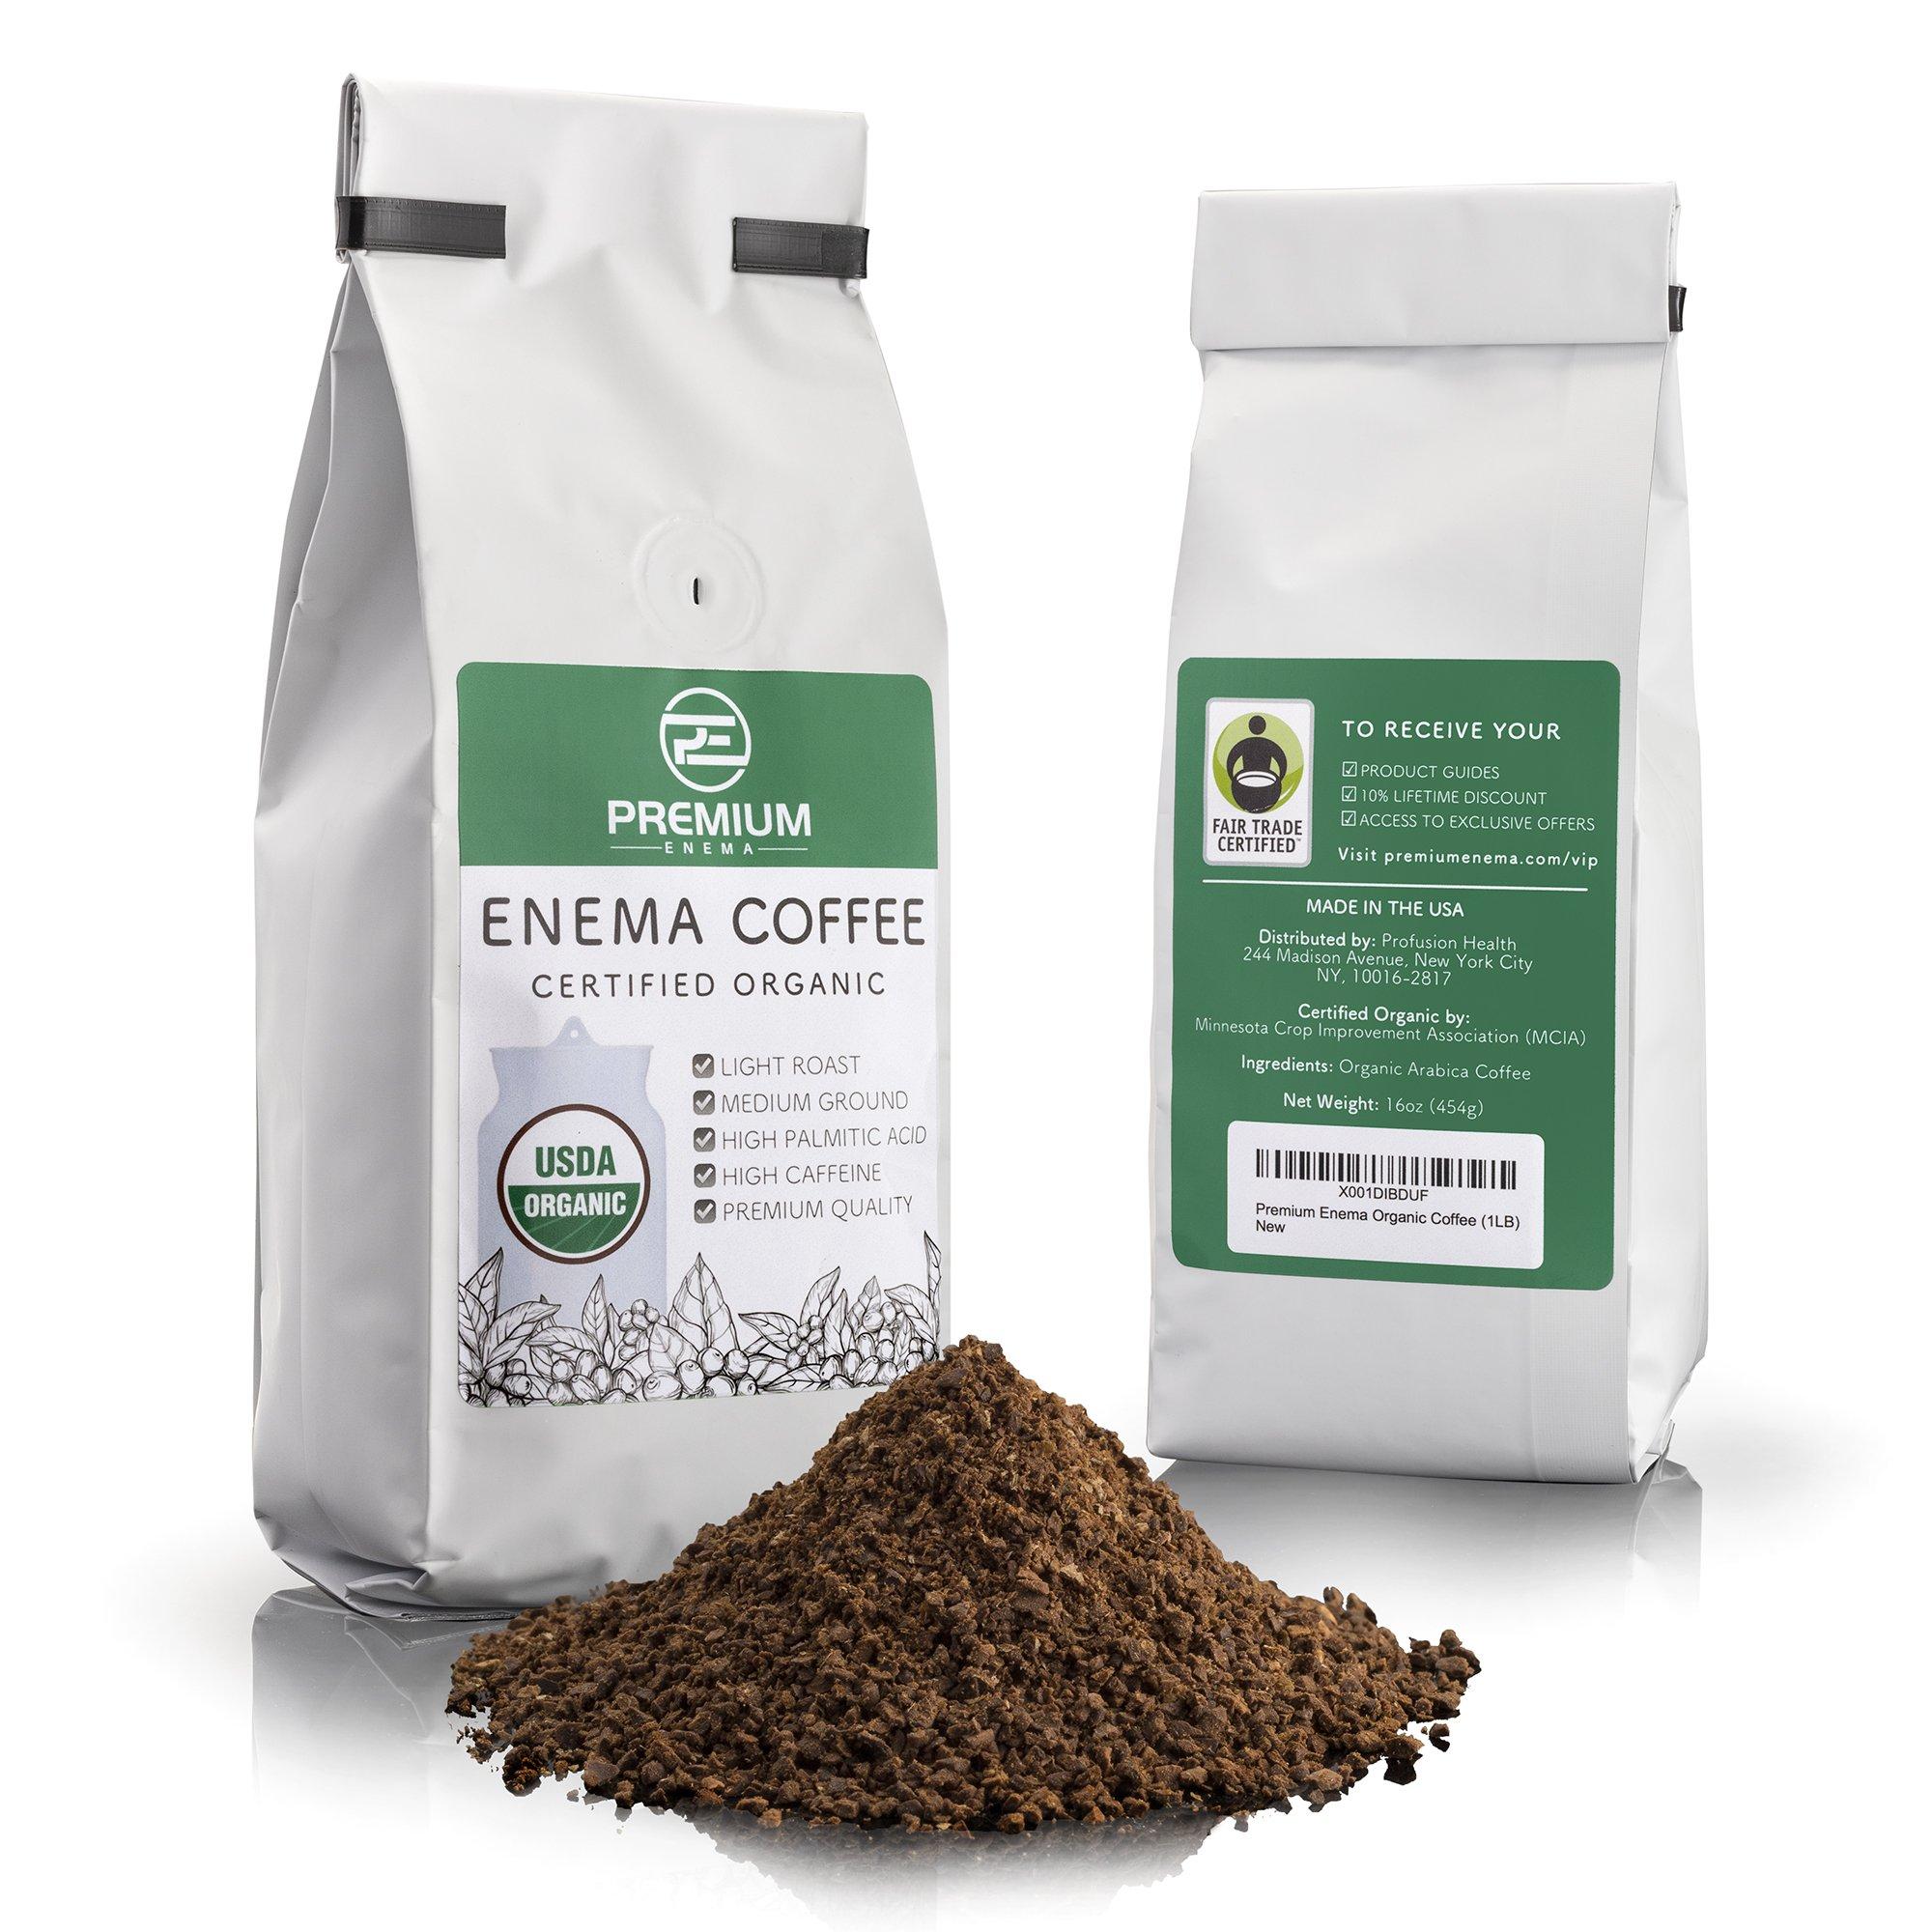 How To Prepare Coffee Enema